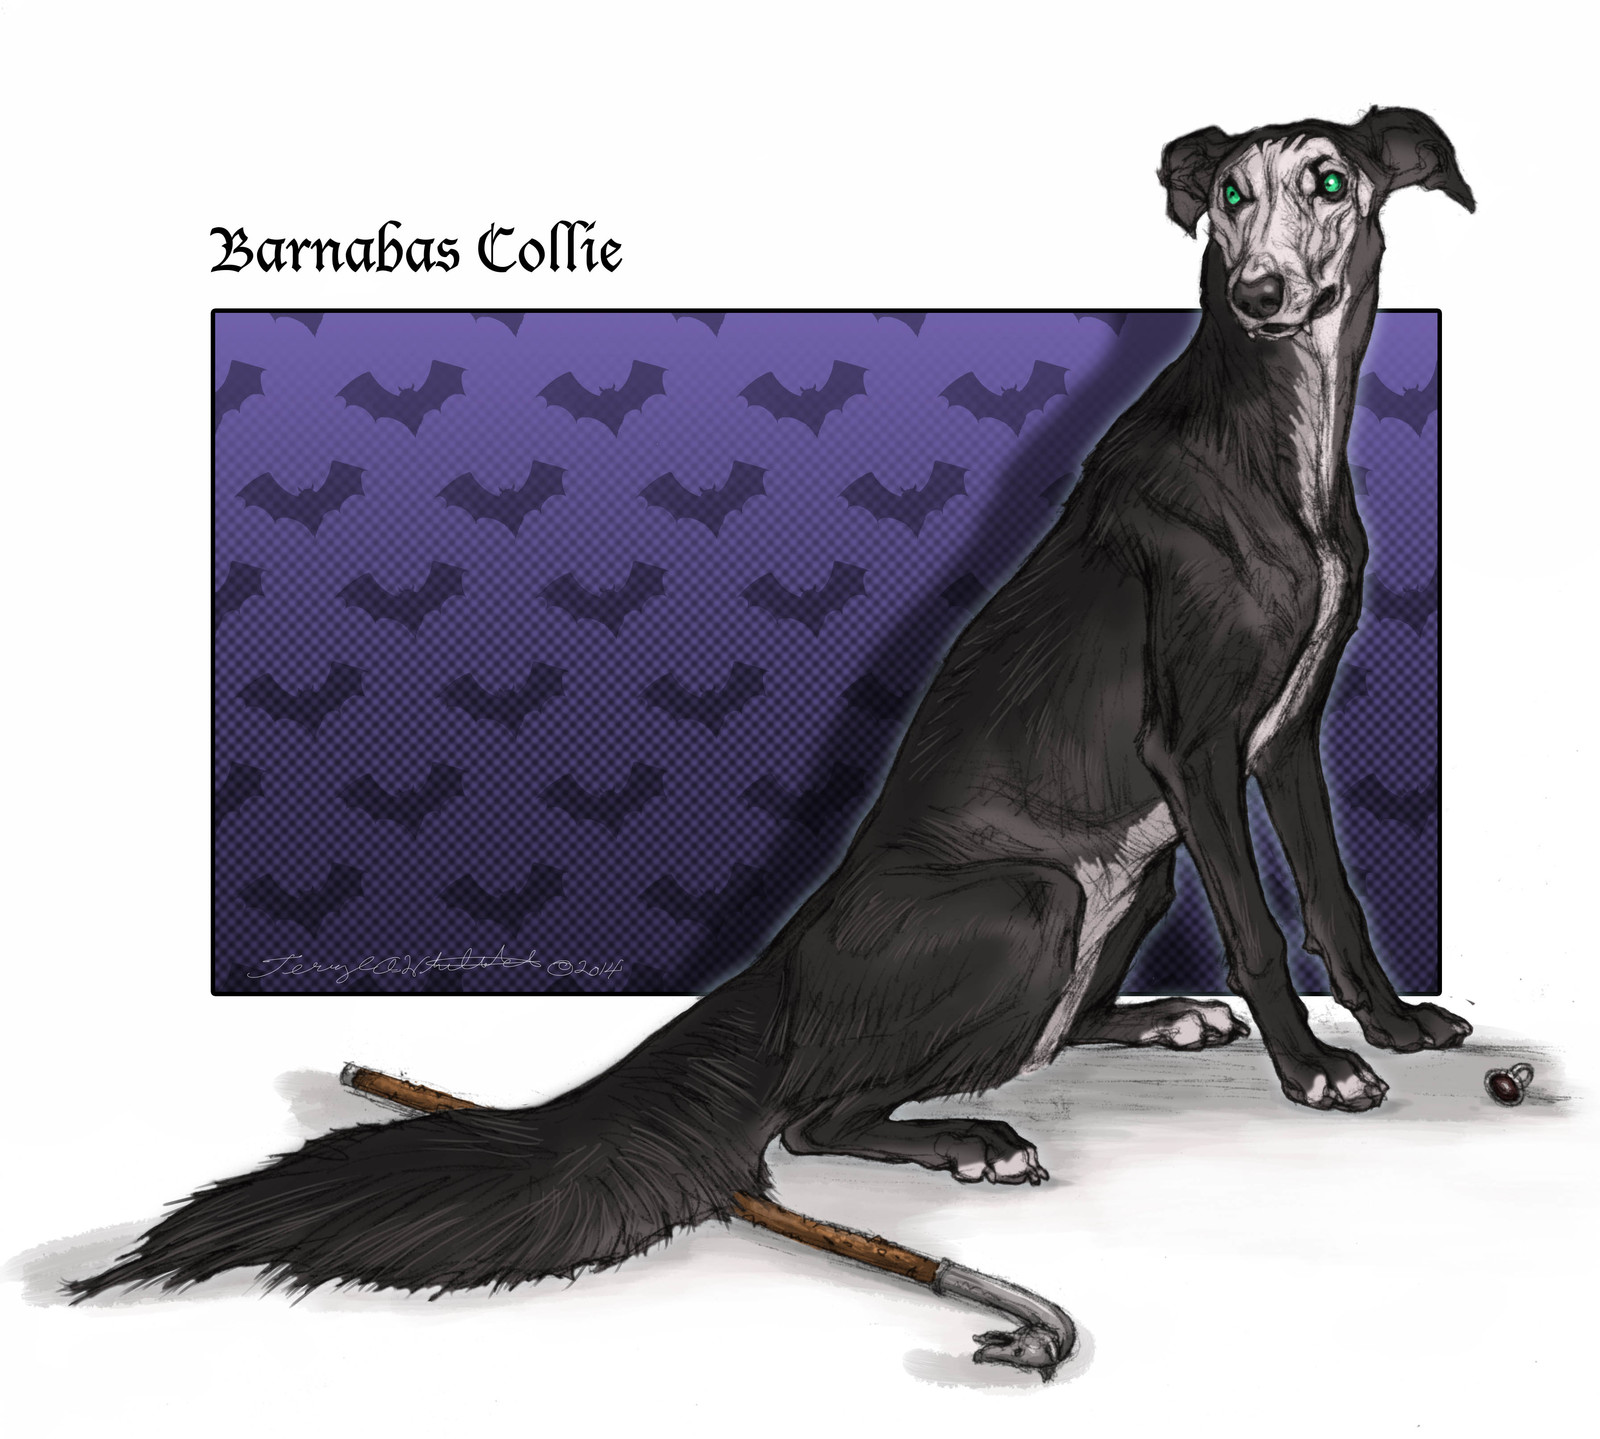 Barnabas Collie